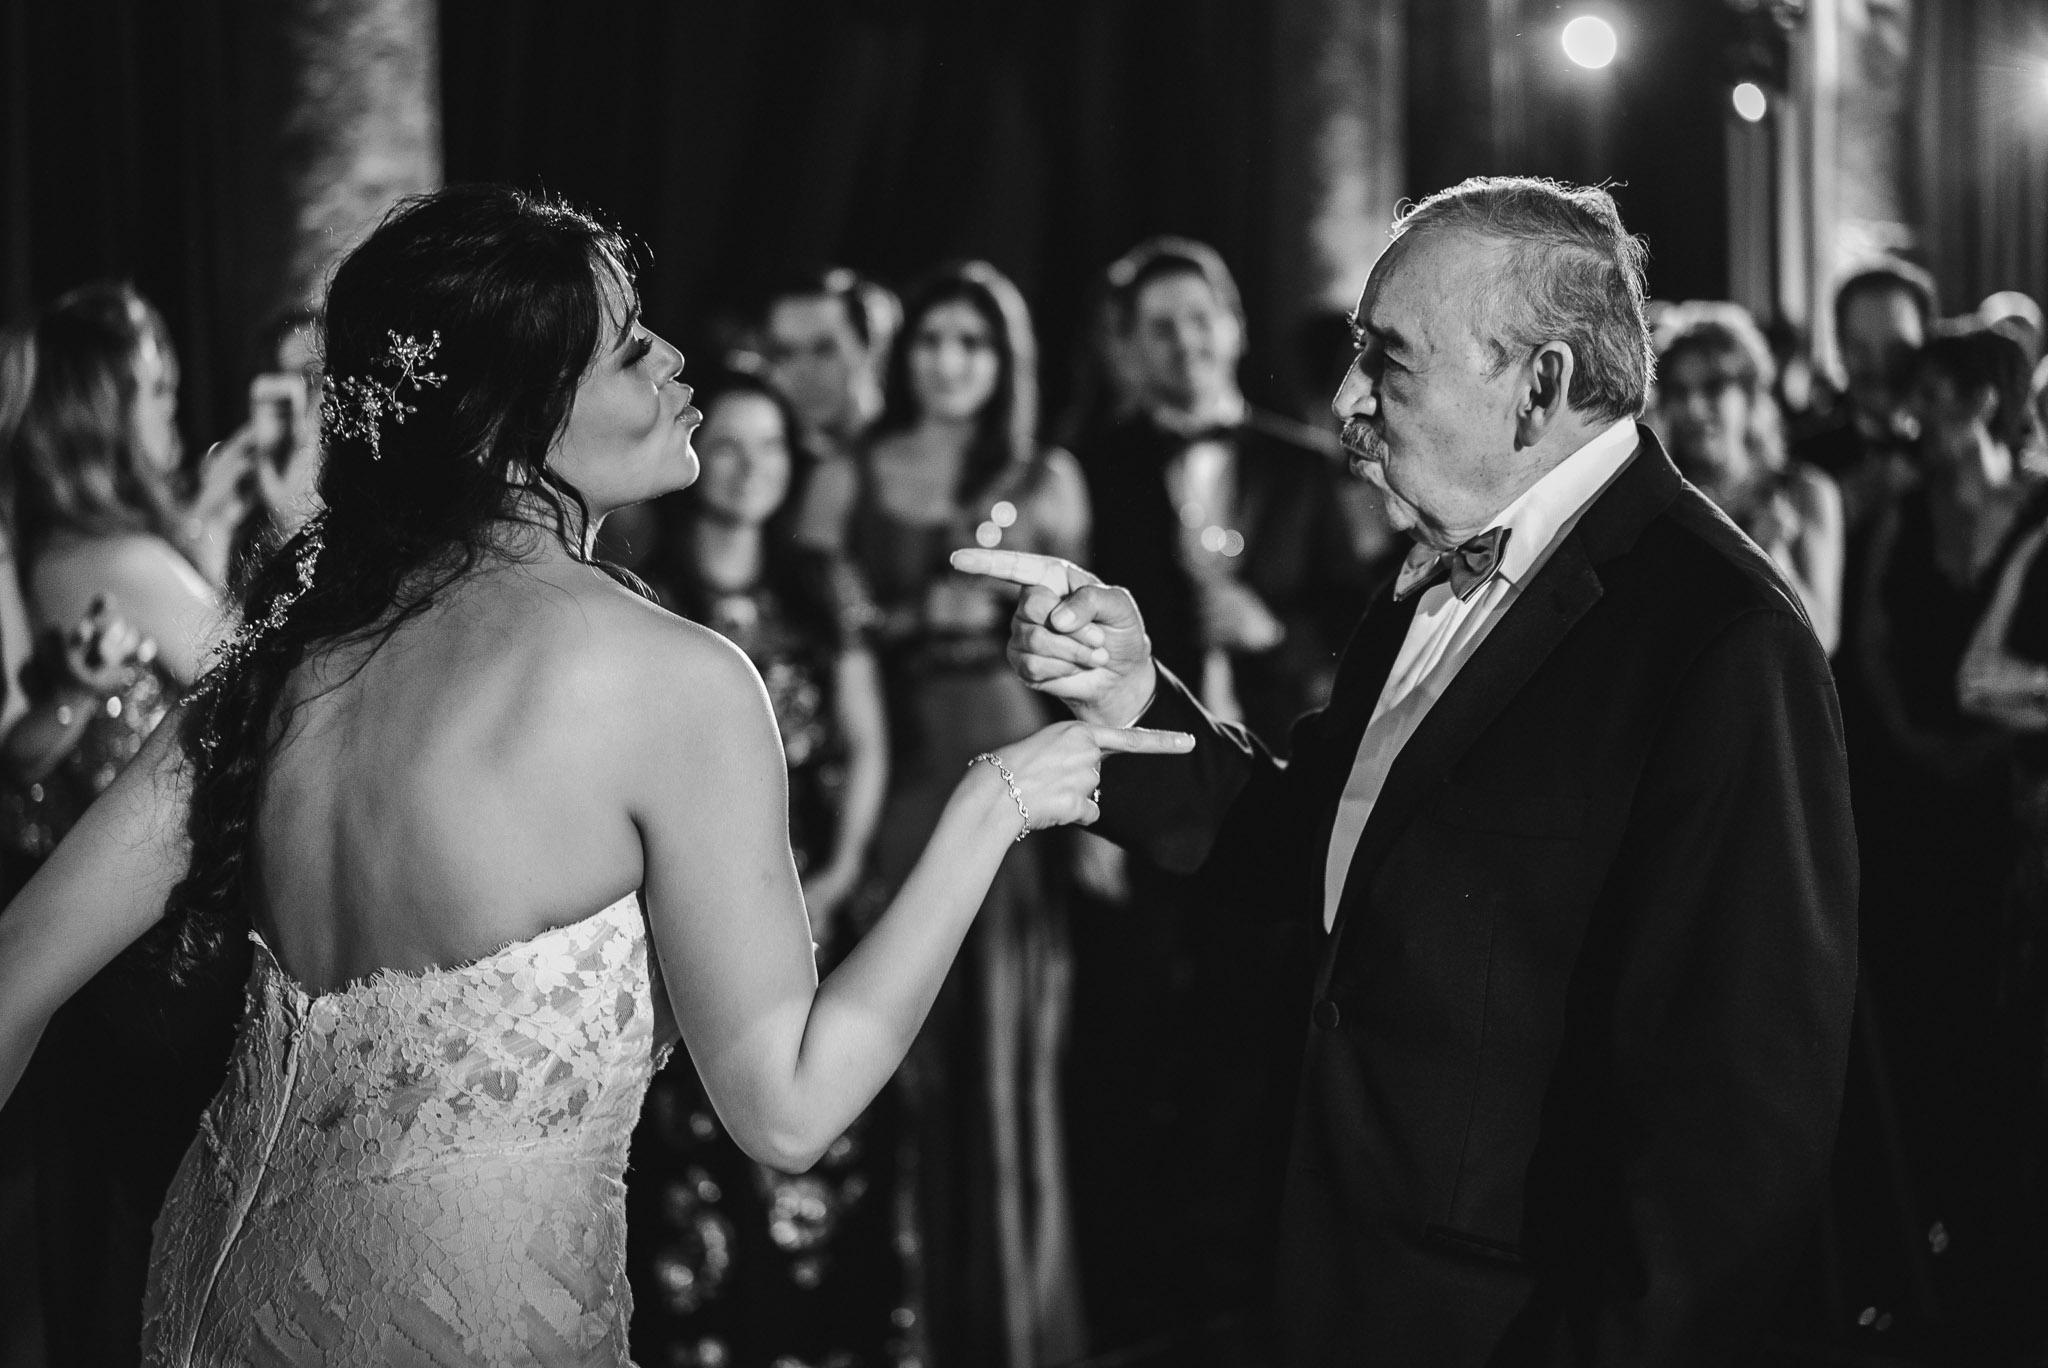 ©www.mauriziosolisbroca.com-20161002maurizio-solis-broca-mexico-canada-wedding-photographer20161002DSC08380-Edit.jpg